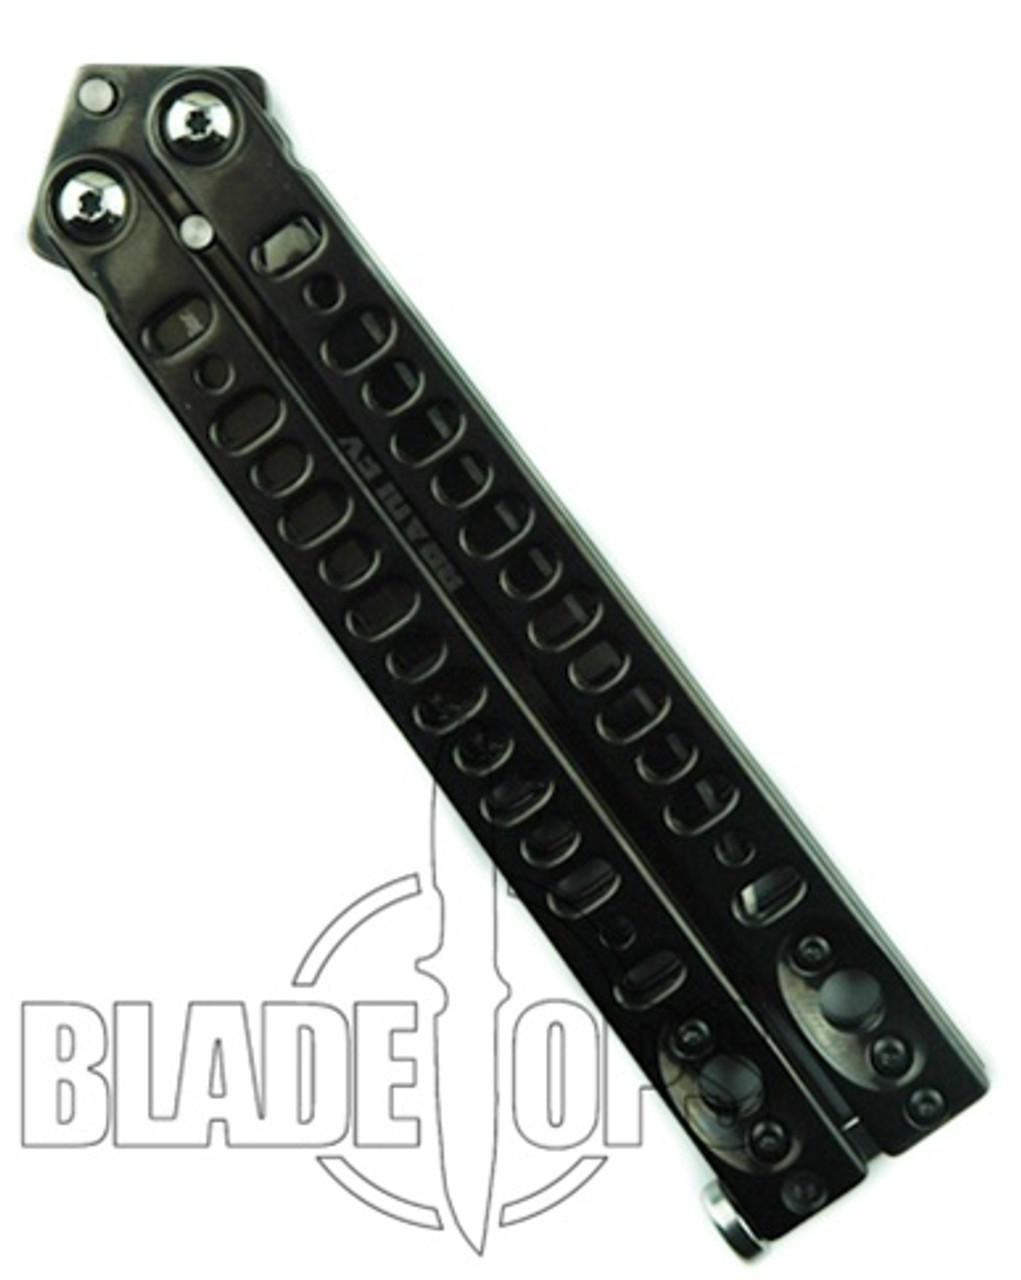 Bradley Kimura IV Butterfly Knife, Limited Edition Polished Black, Clip Point, BC5500-IVBLK